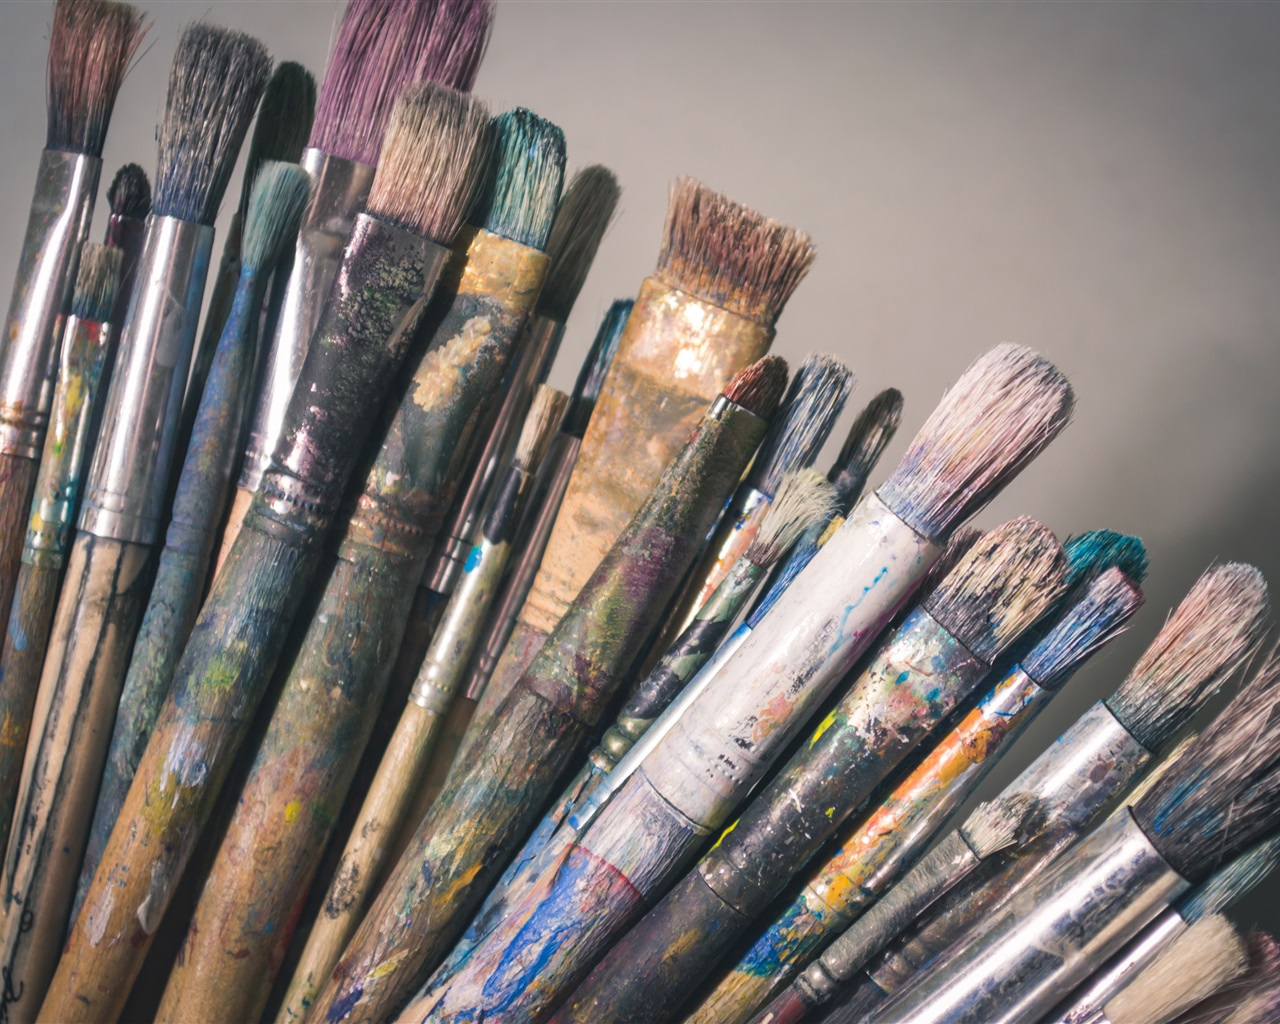 Ipad Retina Wallpaper Art Pain Brush: Fondos De Pantalla Muchos Pinceles De Pintura 3840x2160